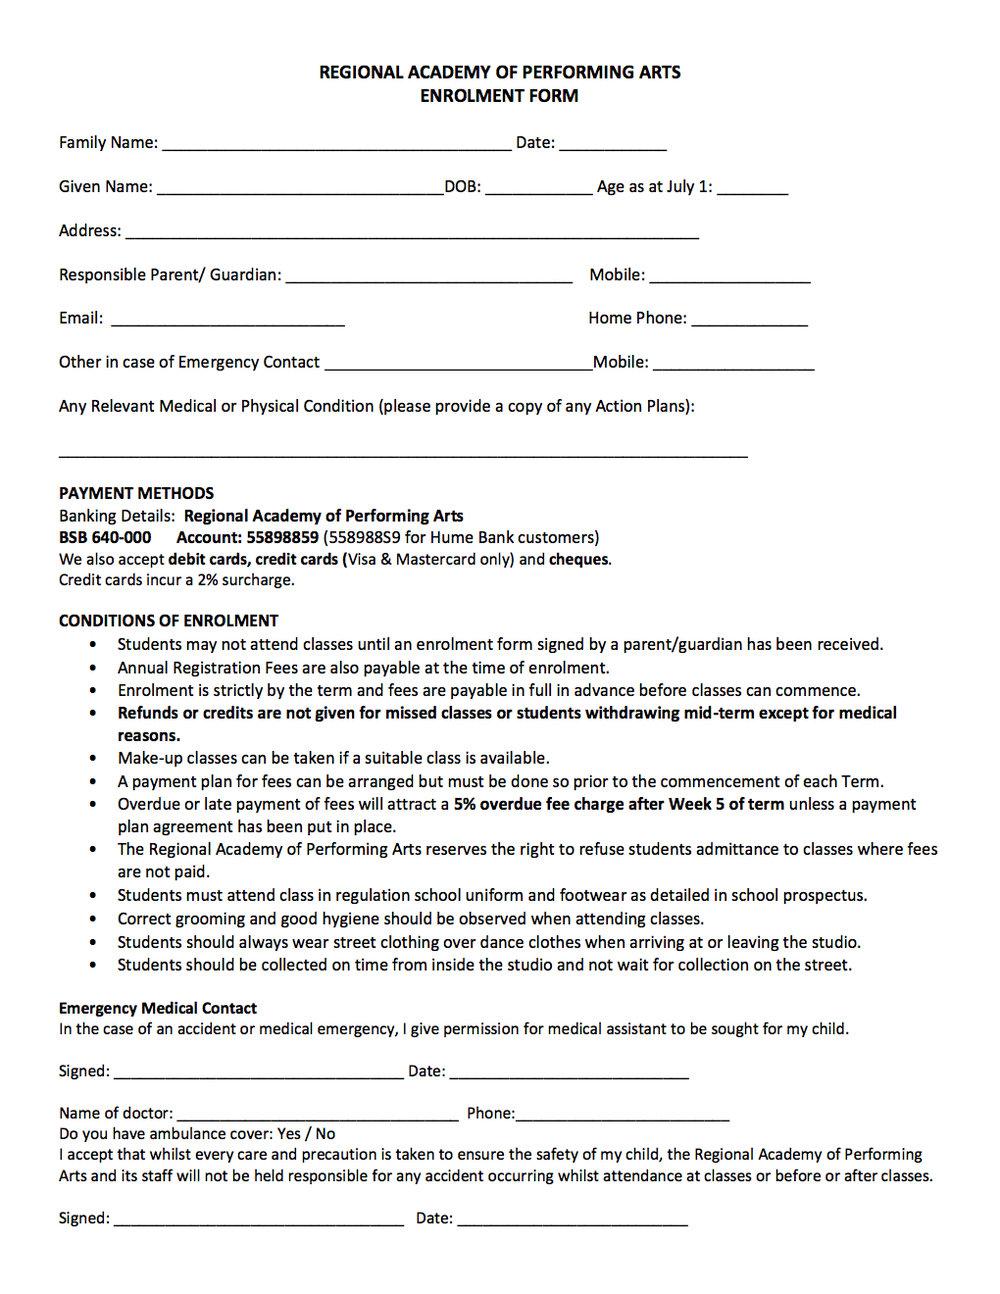 Enrolment Form. .jpg